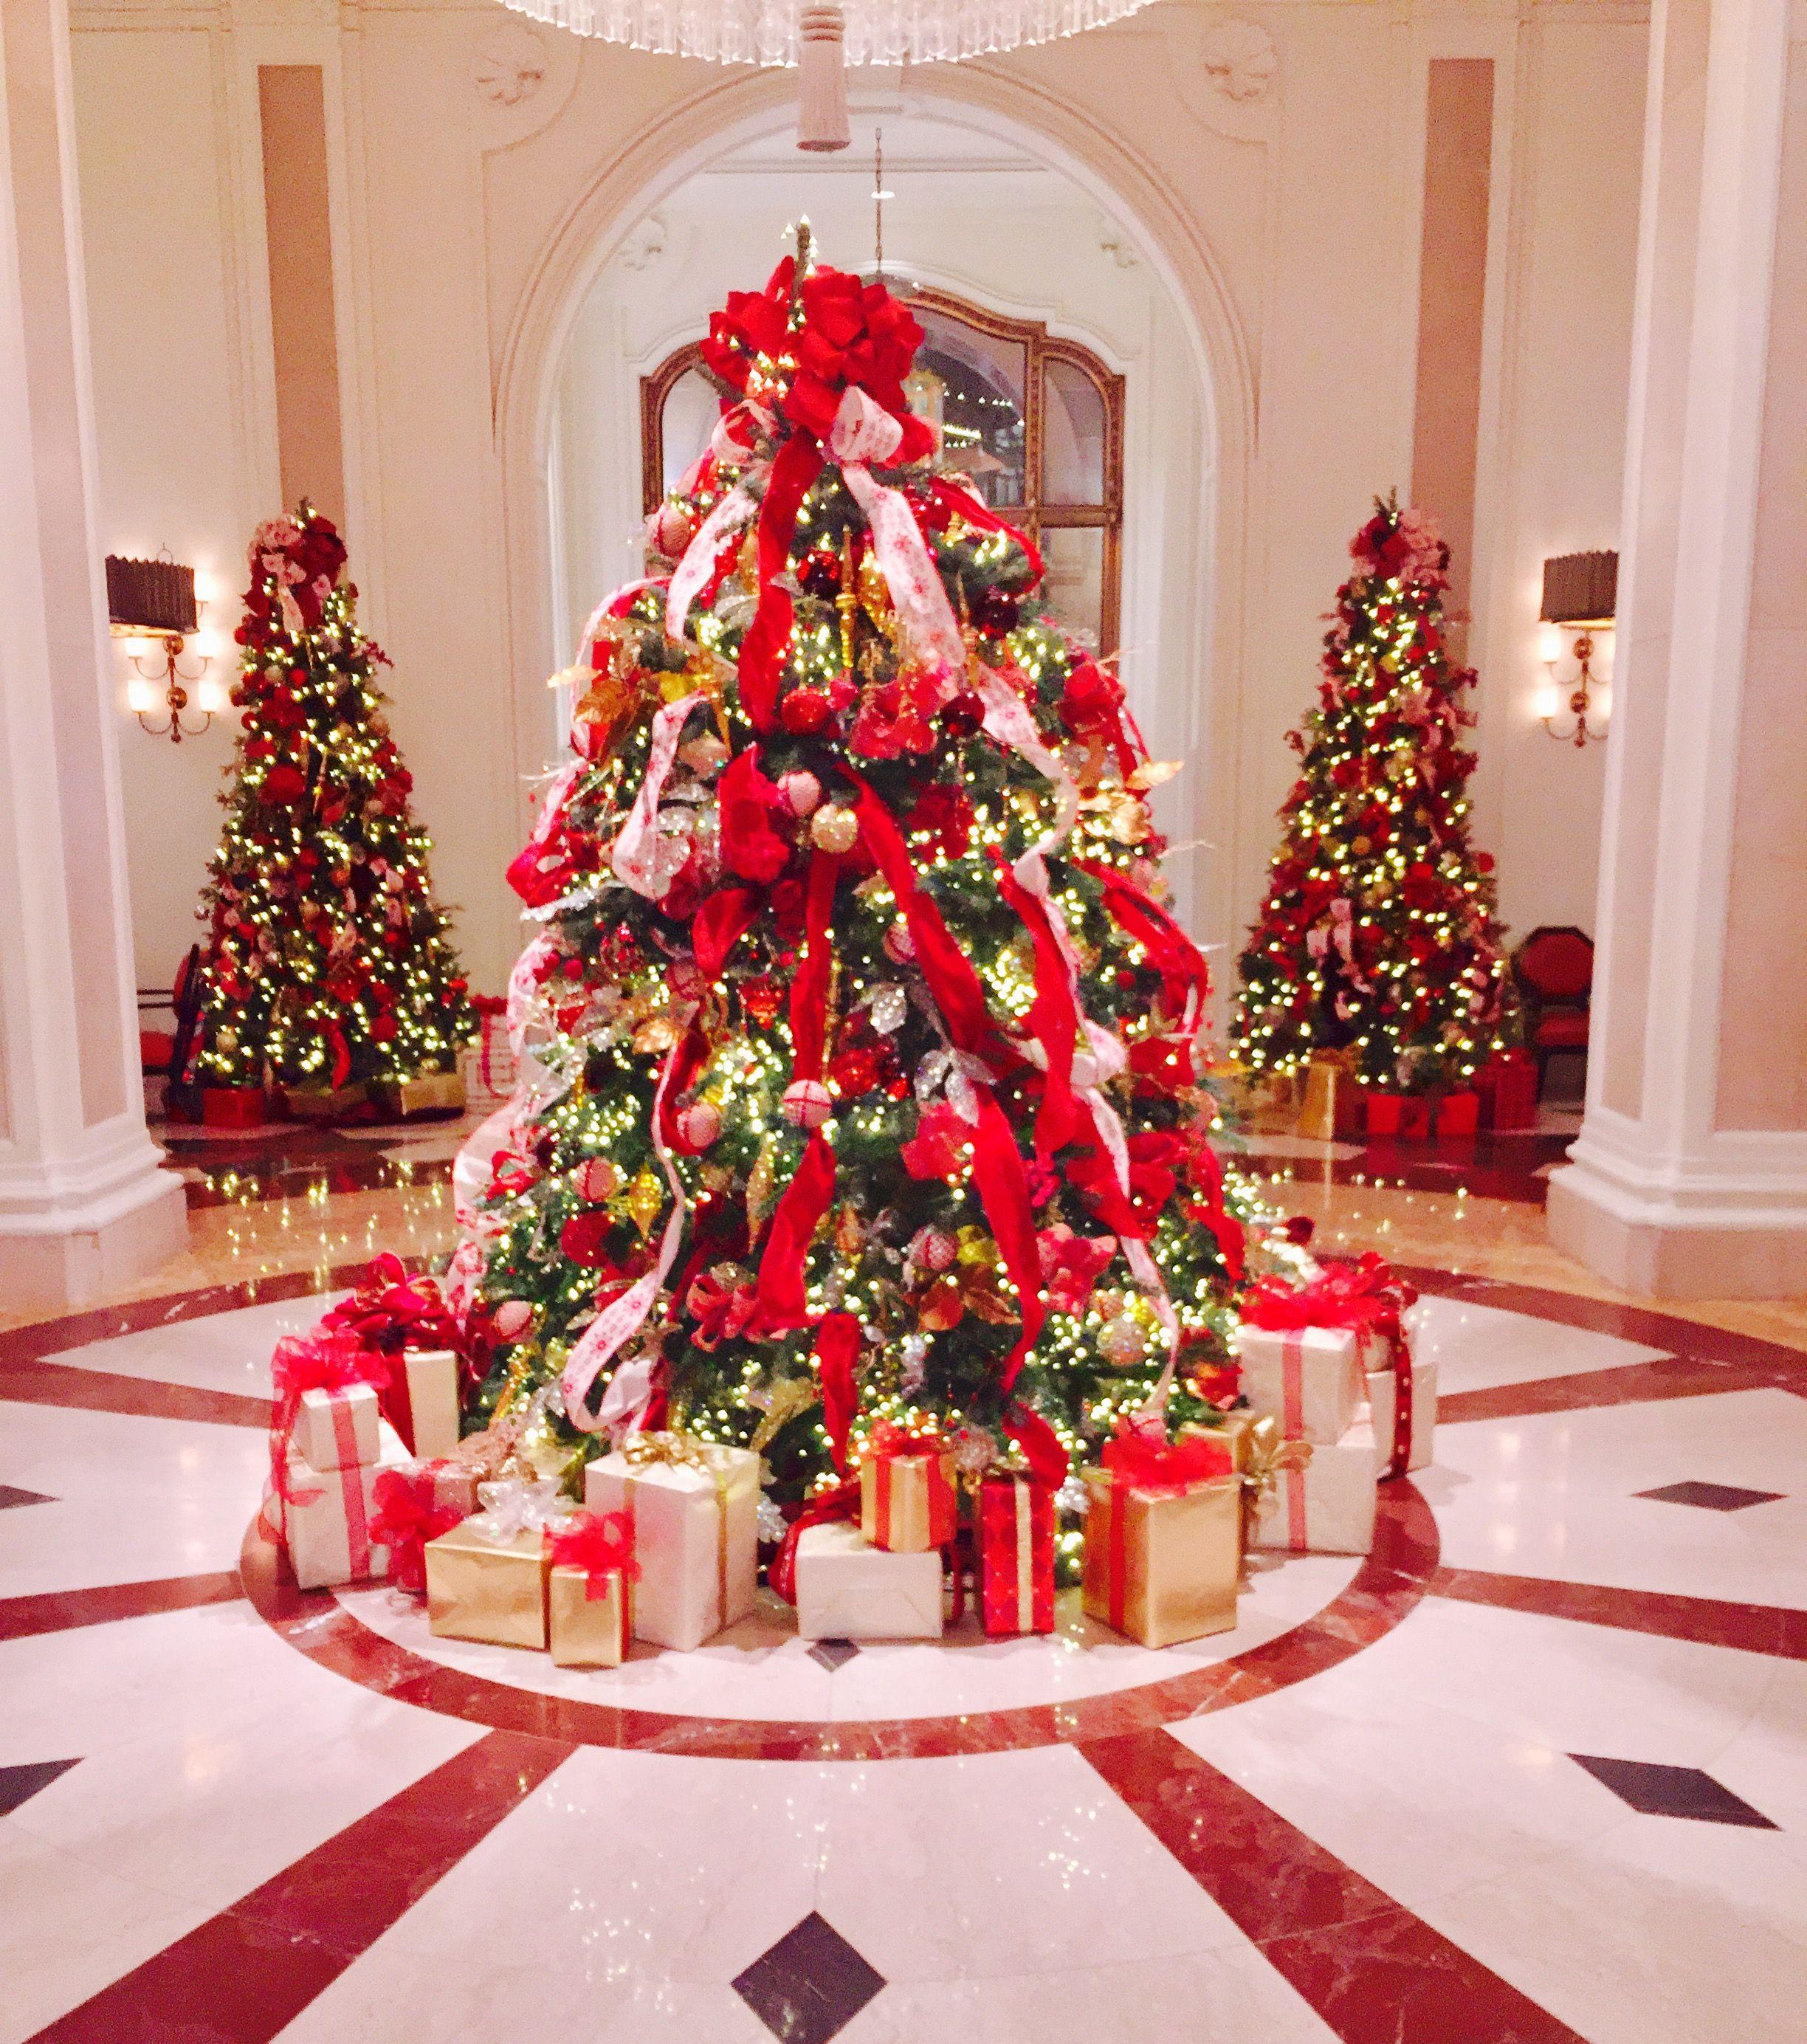 Holiday Decorations At The Beverly Wilshire Four Seasons Holiday Decor Xmas Tree Holiday